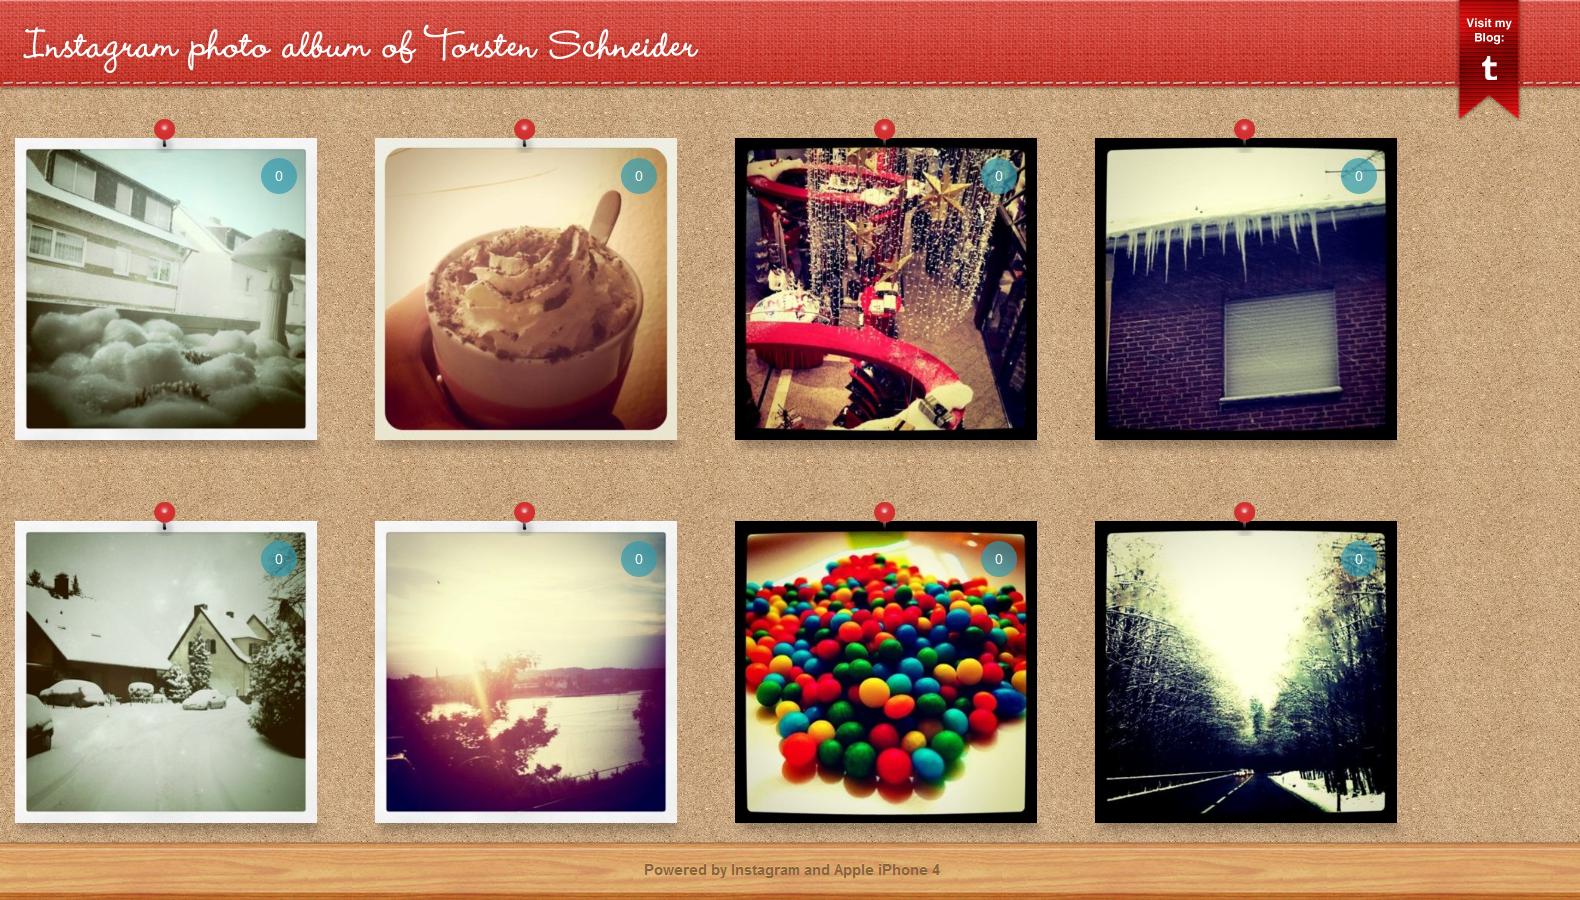 Instagram Photo Blog by novoo